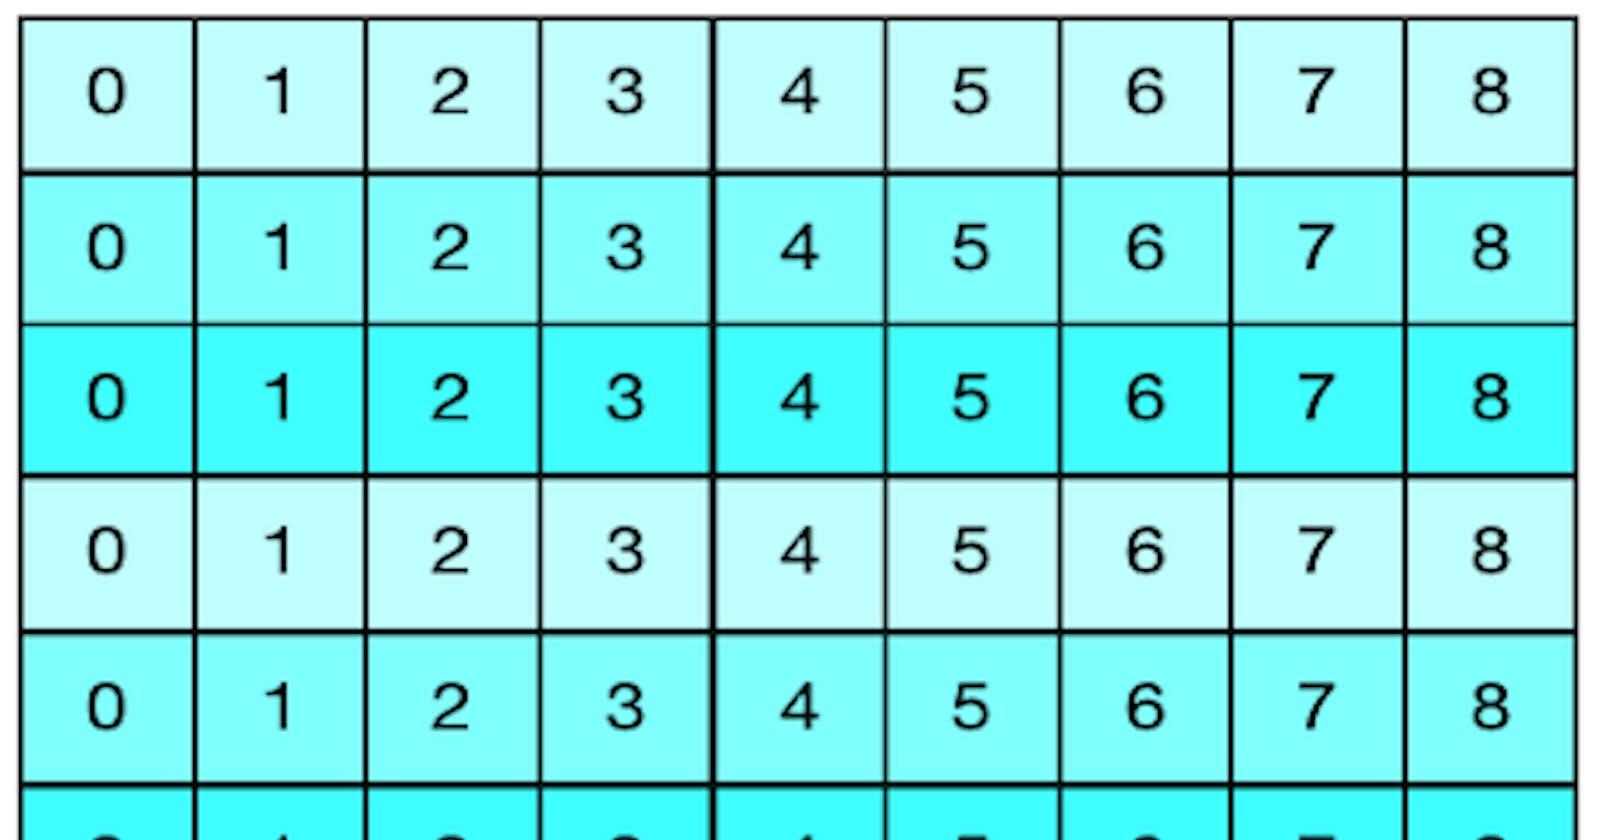 Three effective ways to create modulo n integer sequences